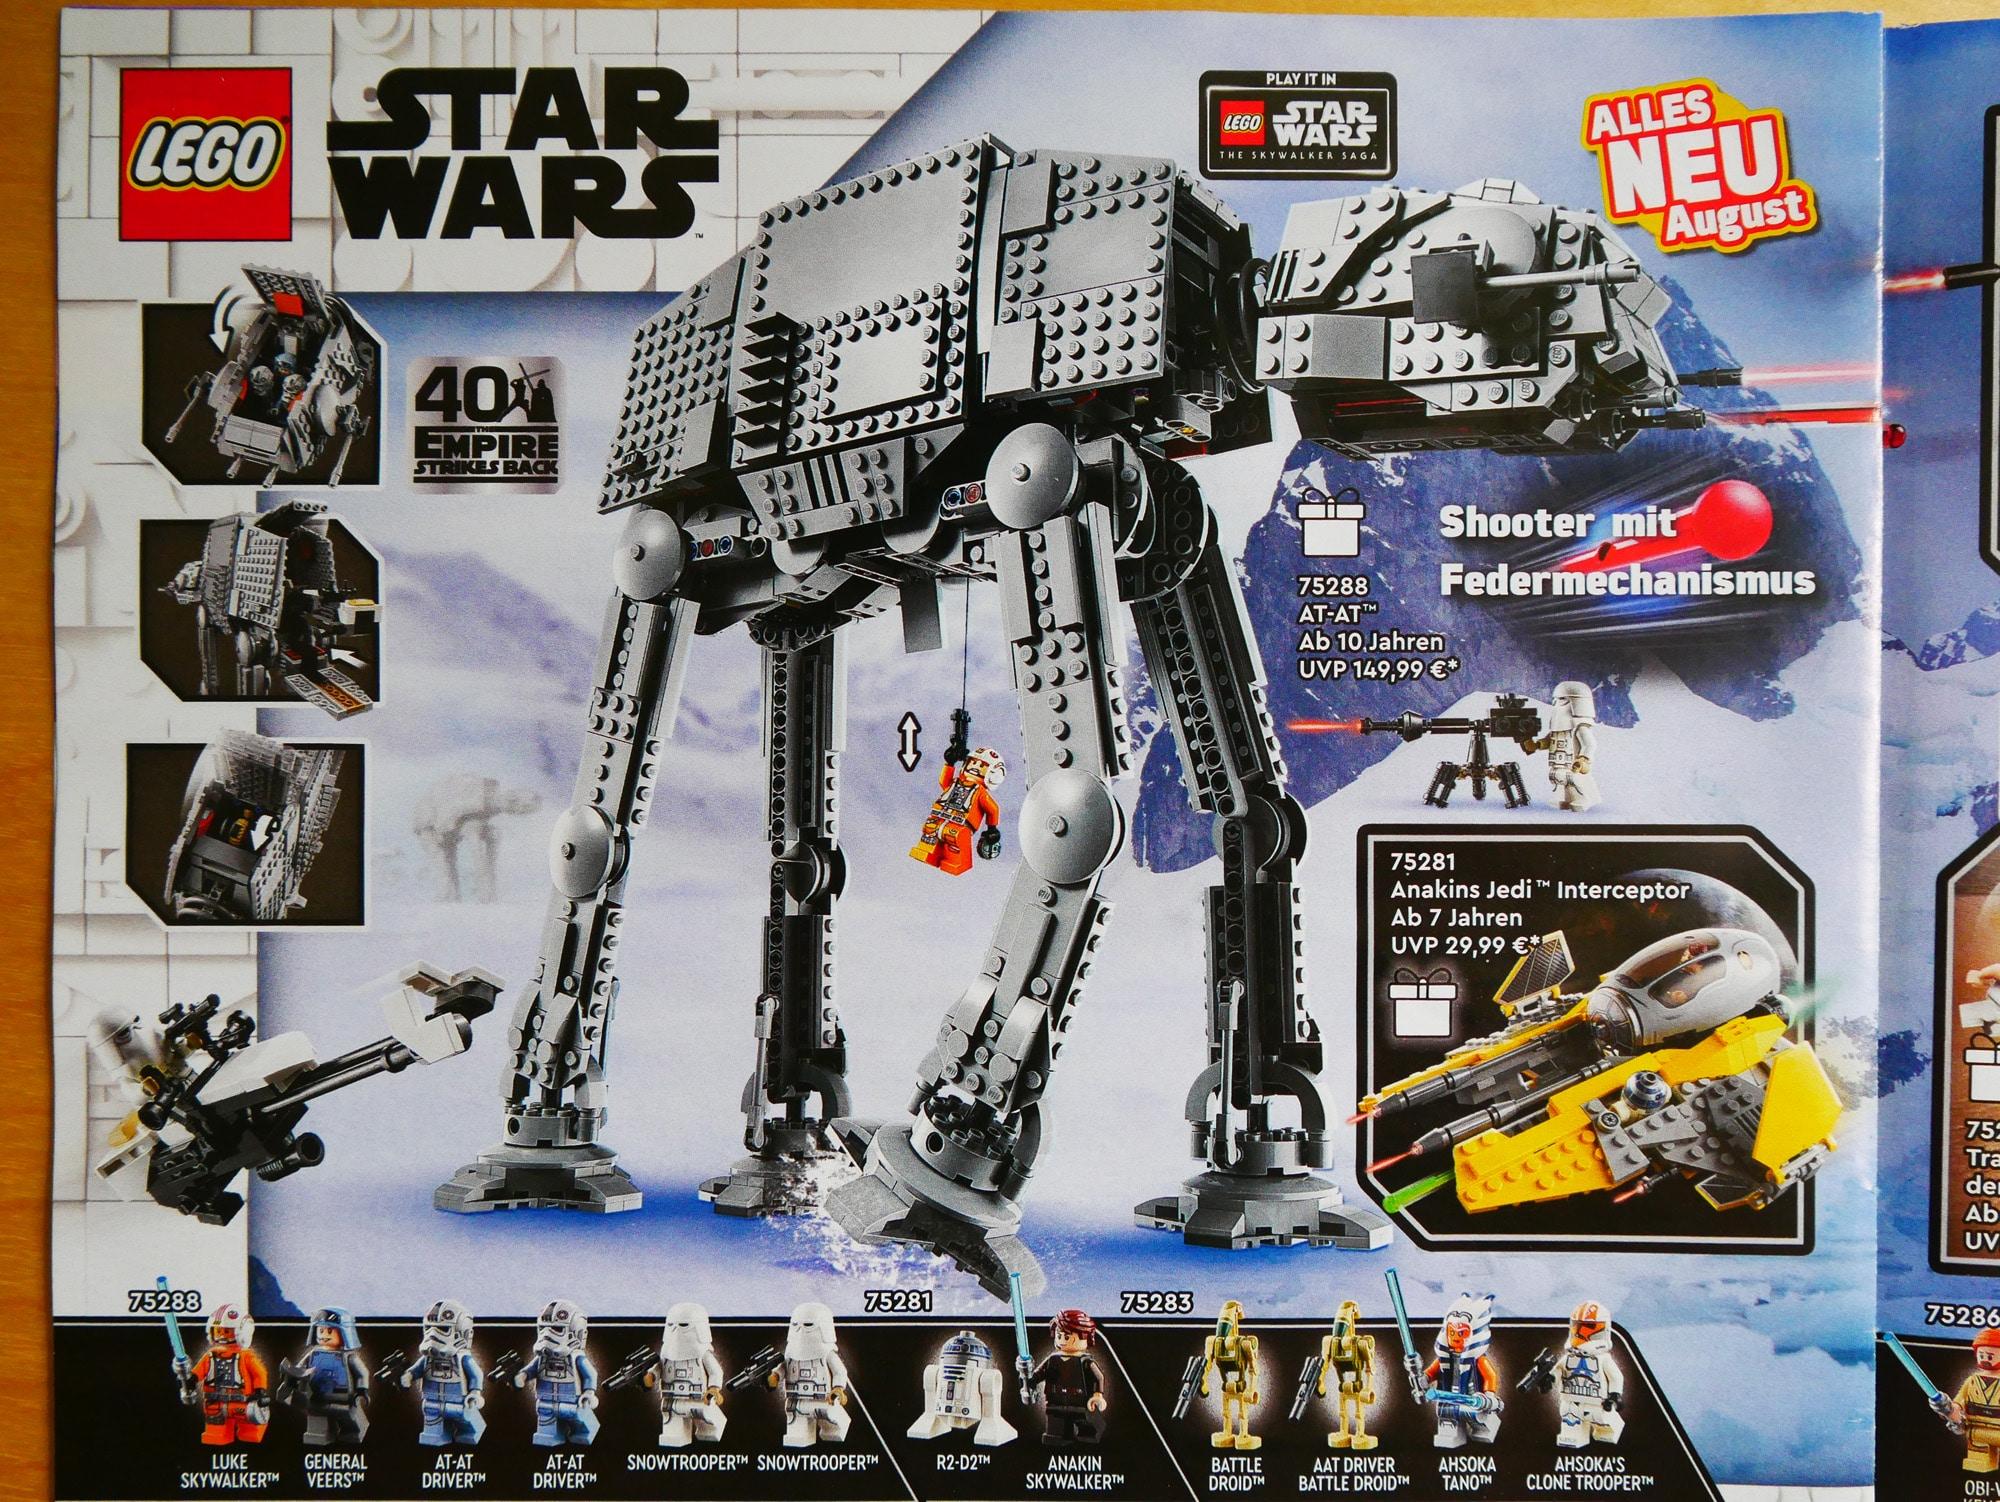 LEGO Star Wars August 2020 (1)